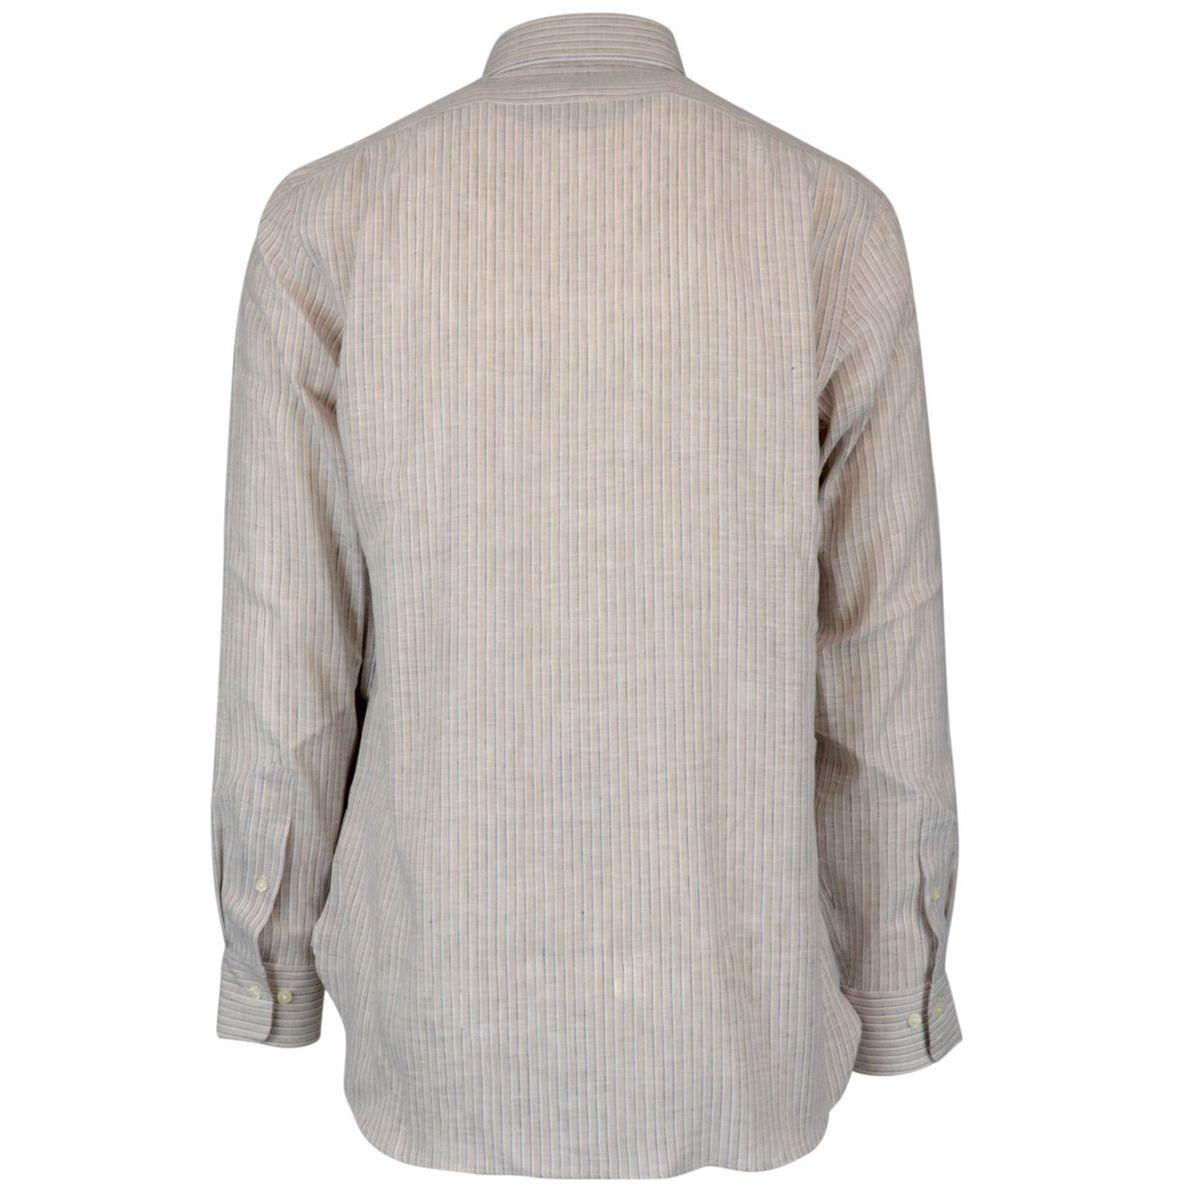 Classic Fit linen shirt with French collar Ecru Polo Ralph Lauren